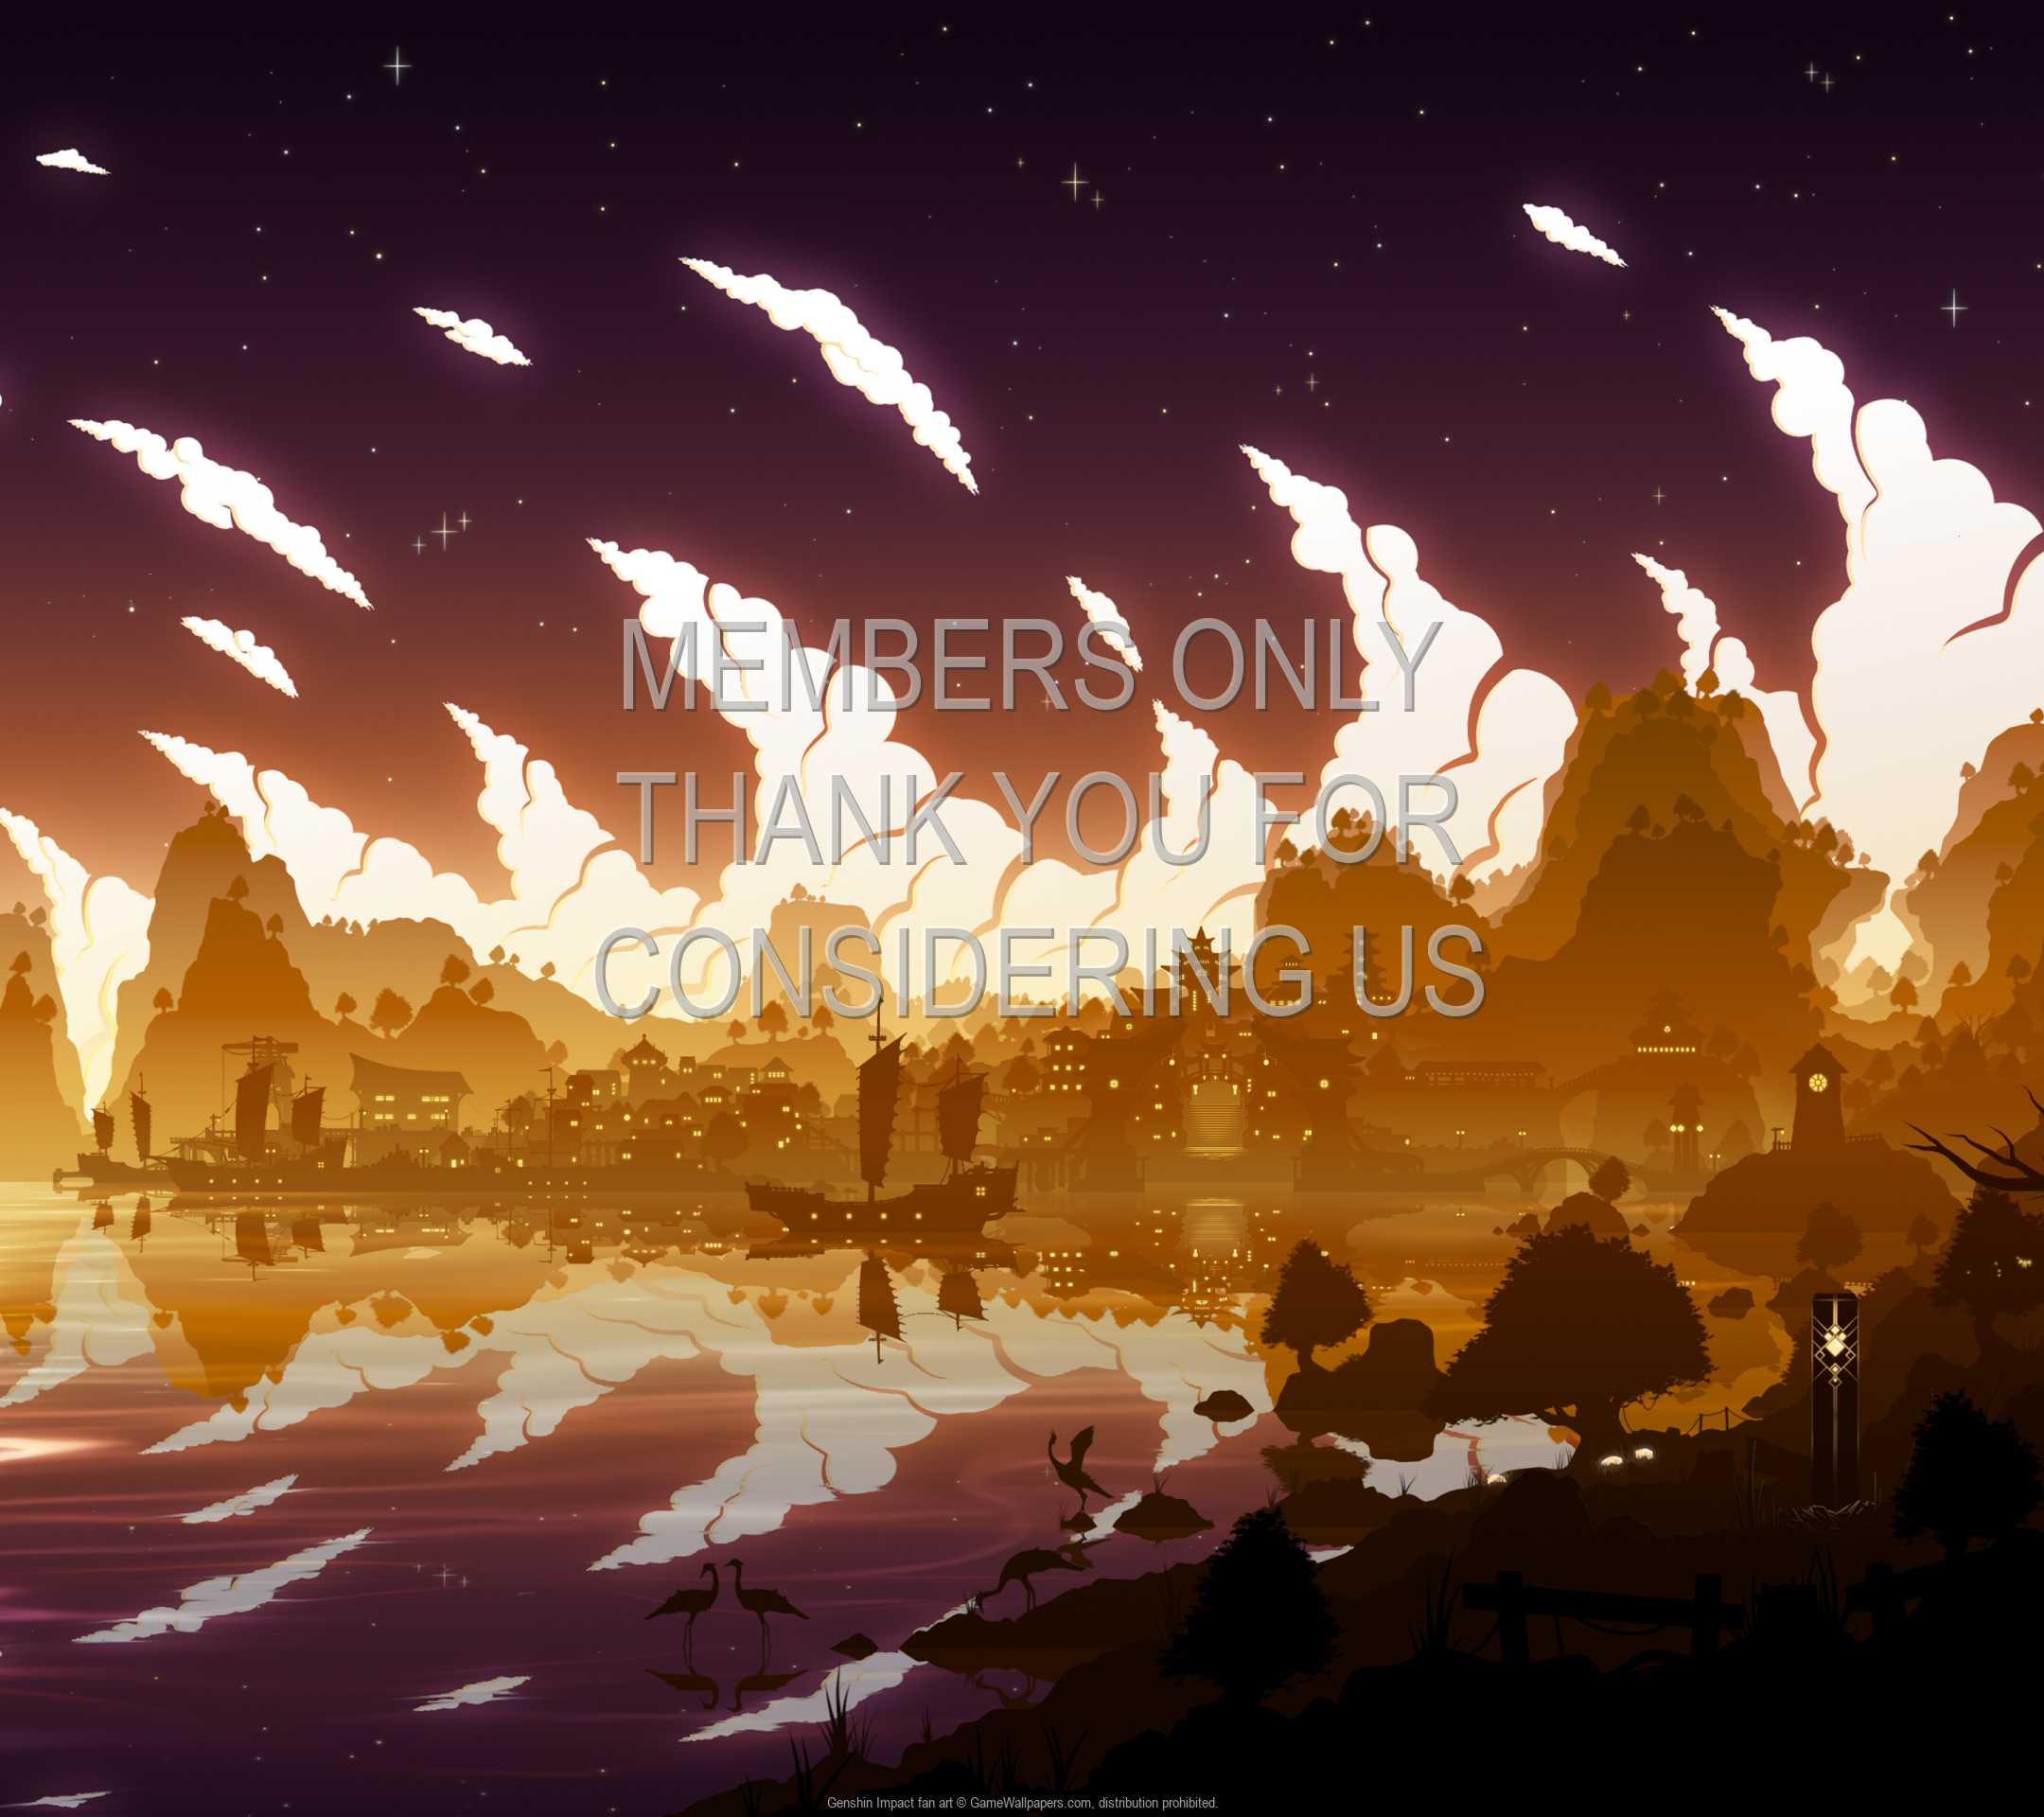 Genshin Impact fan art 1080p Horizontal Móvil fondo de escritorio 01